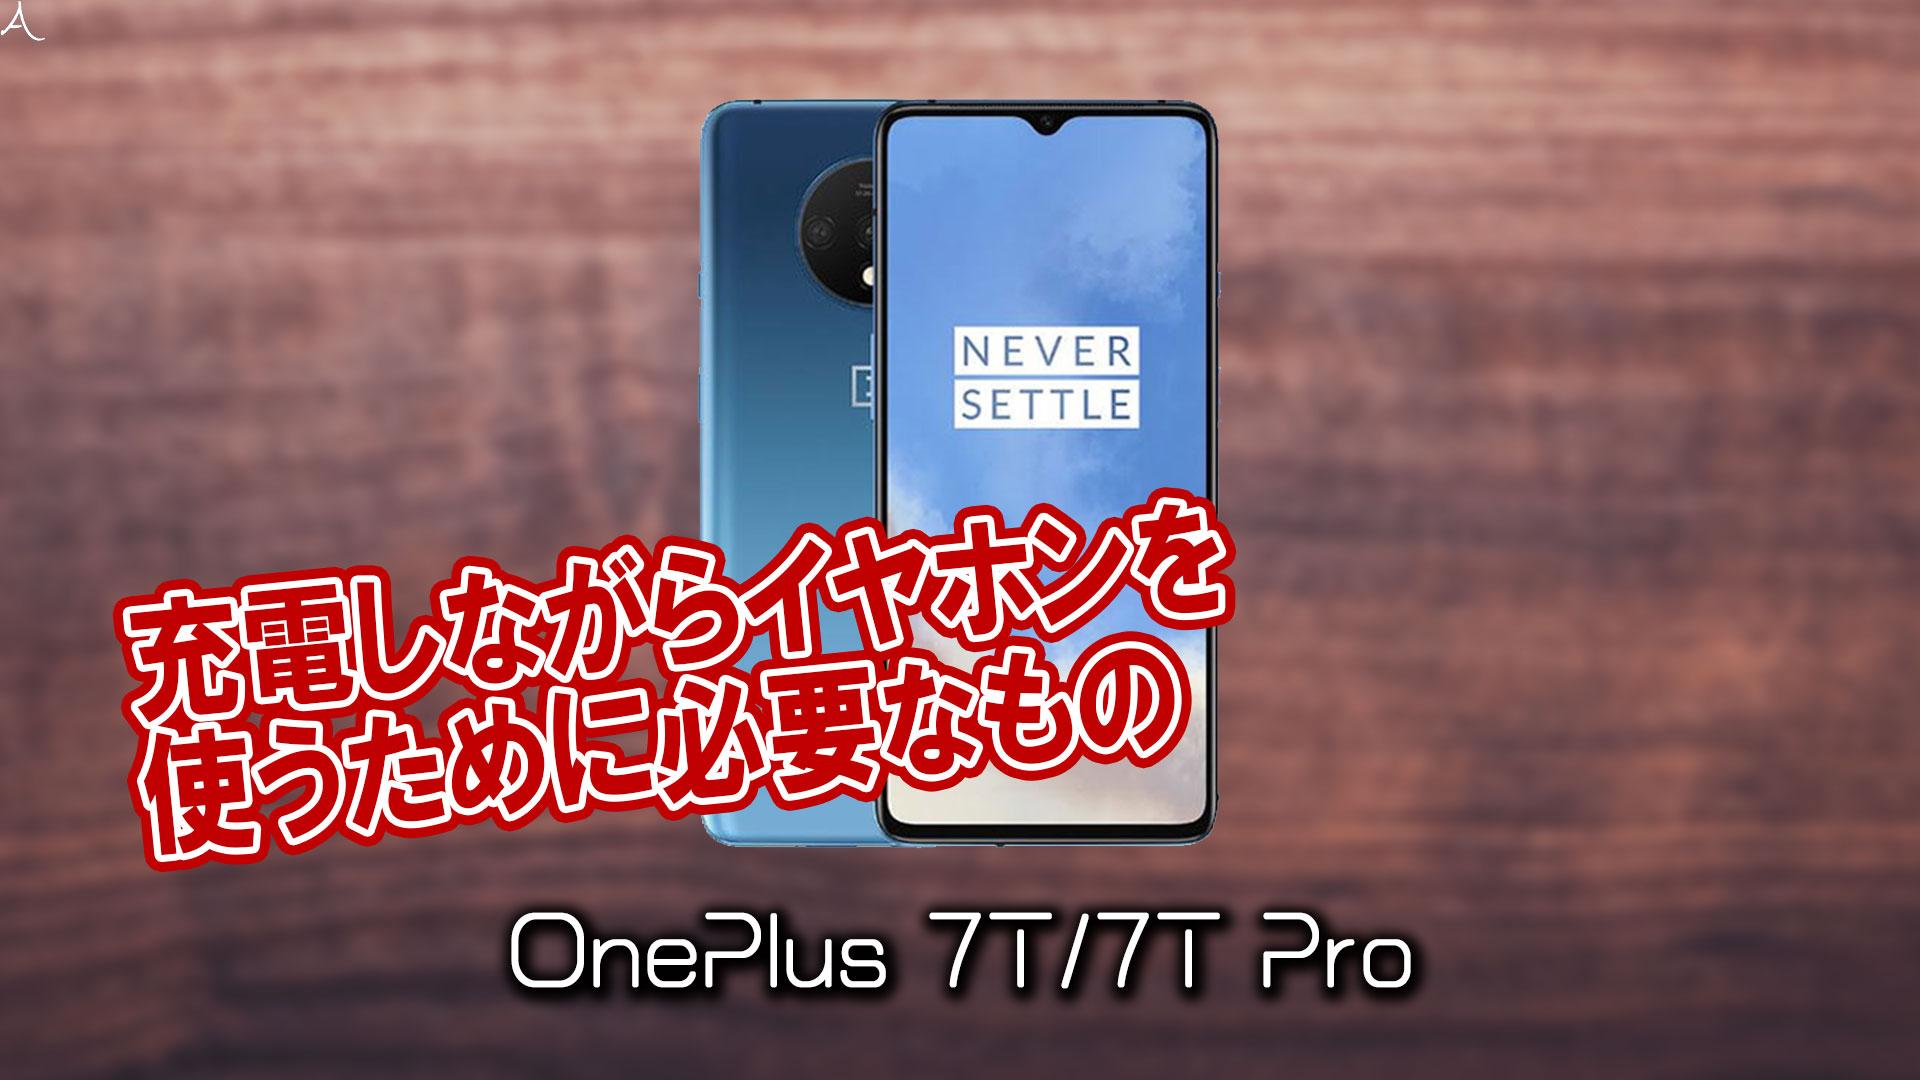 「OnePlus 7T/7T Pro」で充電しながらイヤホンを使うために必要なもの